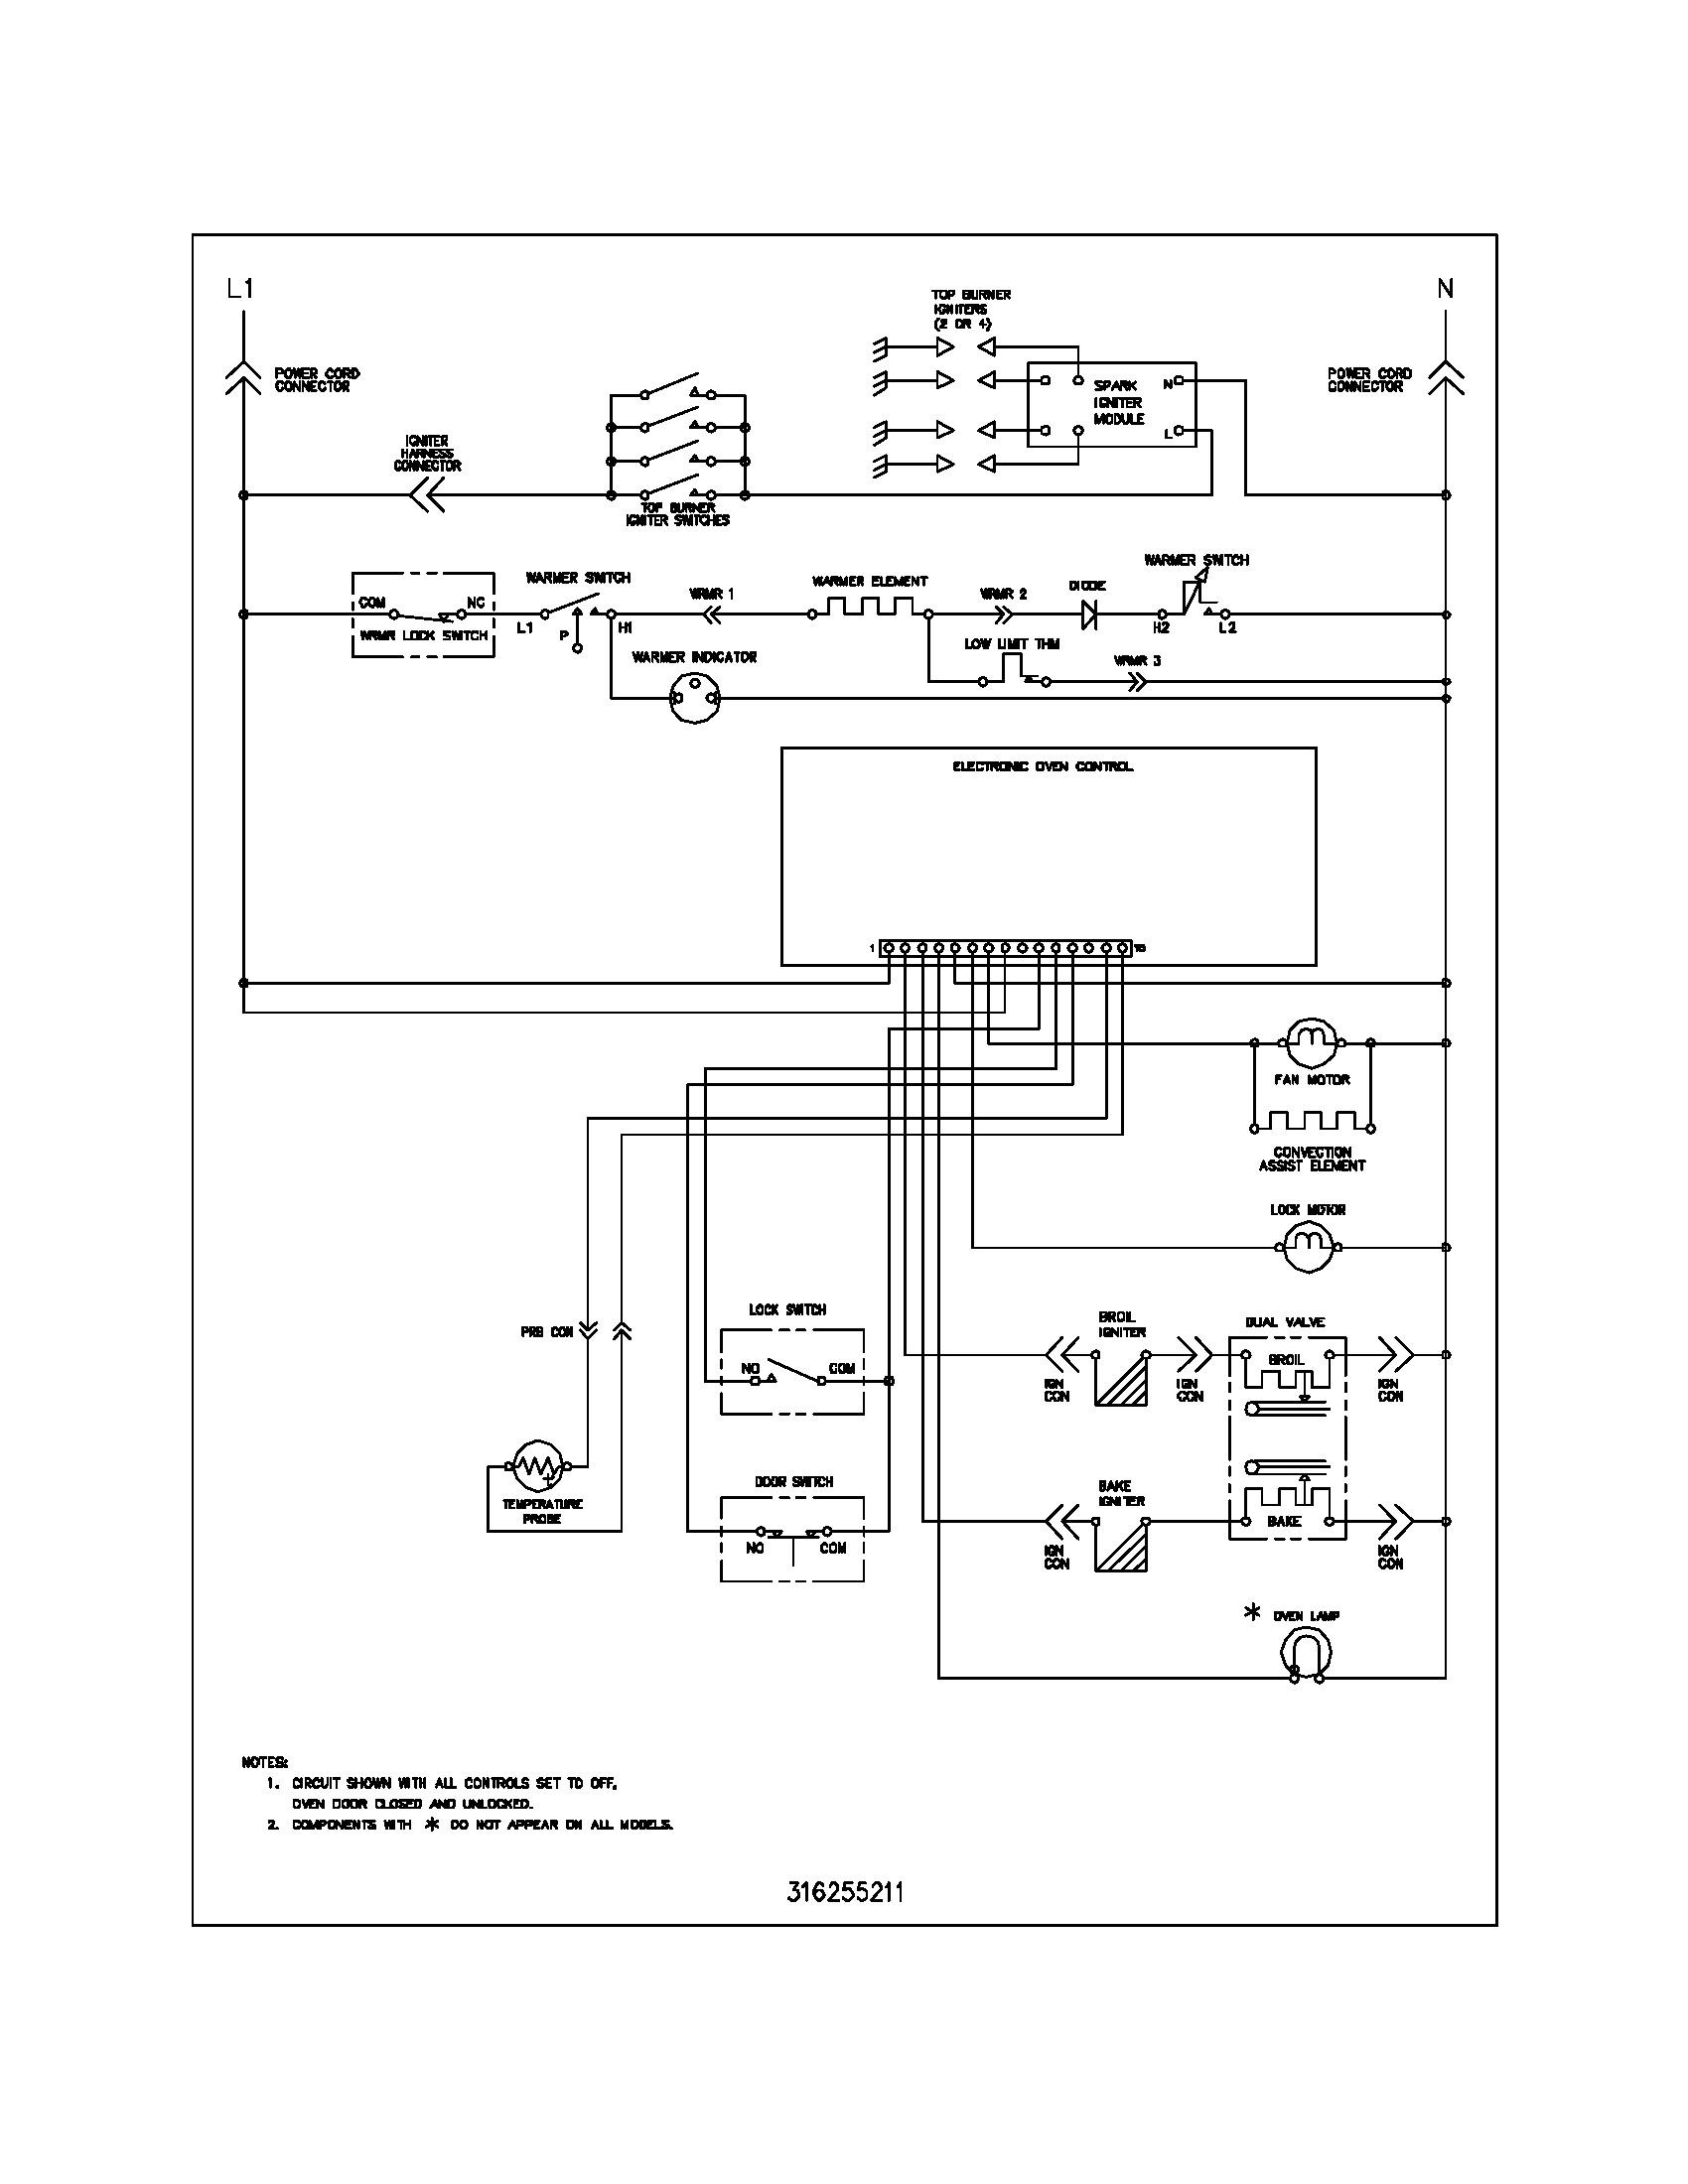 Gas Furnace Wiring Diagram Fine Design General Electric Frigidaire Plgf Ccc Range Schematic Parts Resize